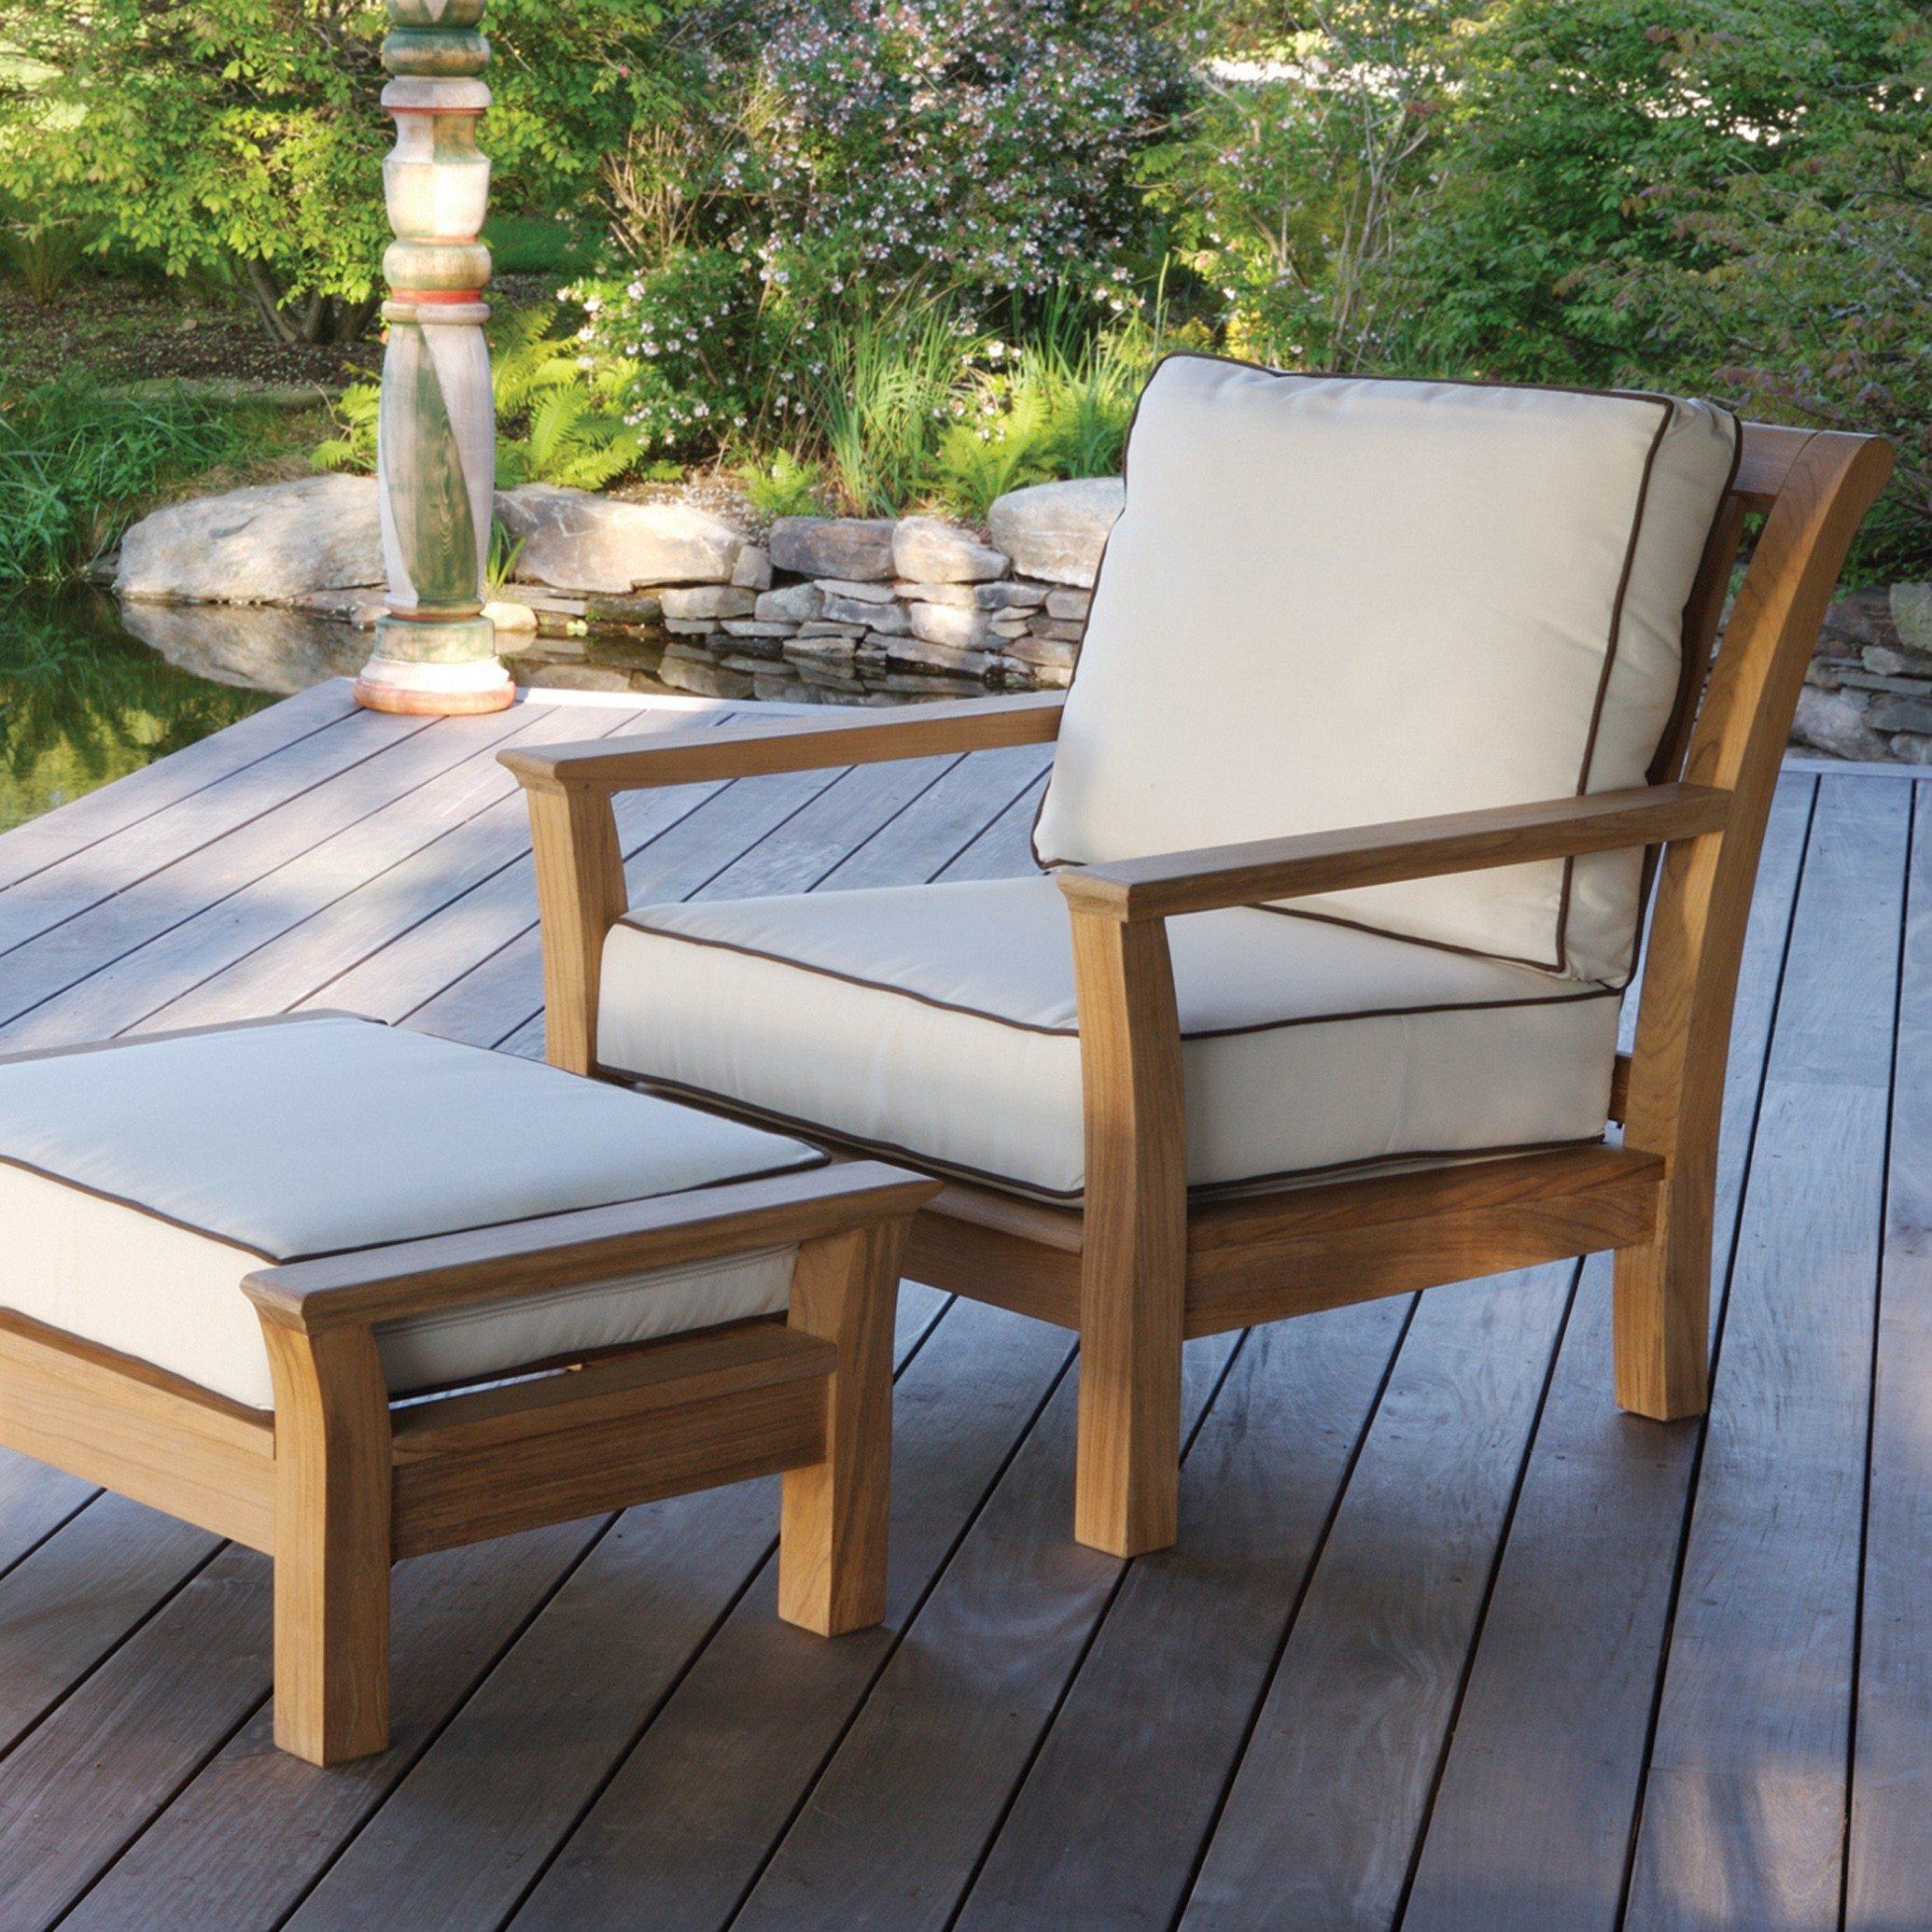 Fabulous Kingsley Bate Chelsea Teak Deep Seating Lounge Chair Pdpeps Interior Chair Design Pdpepsorg